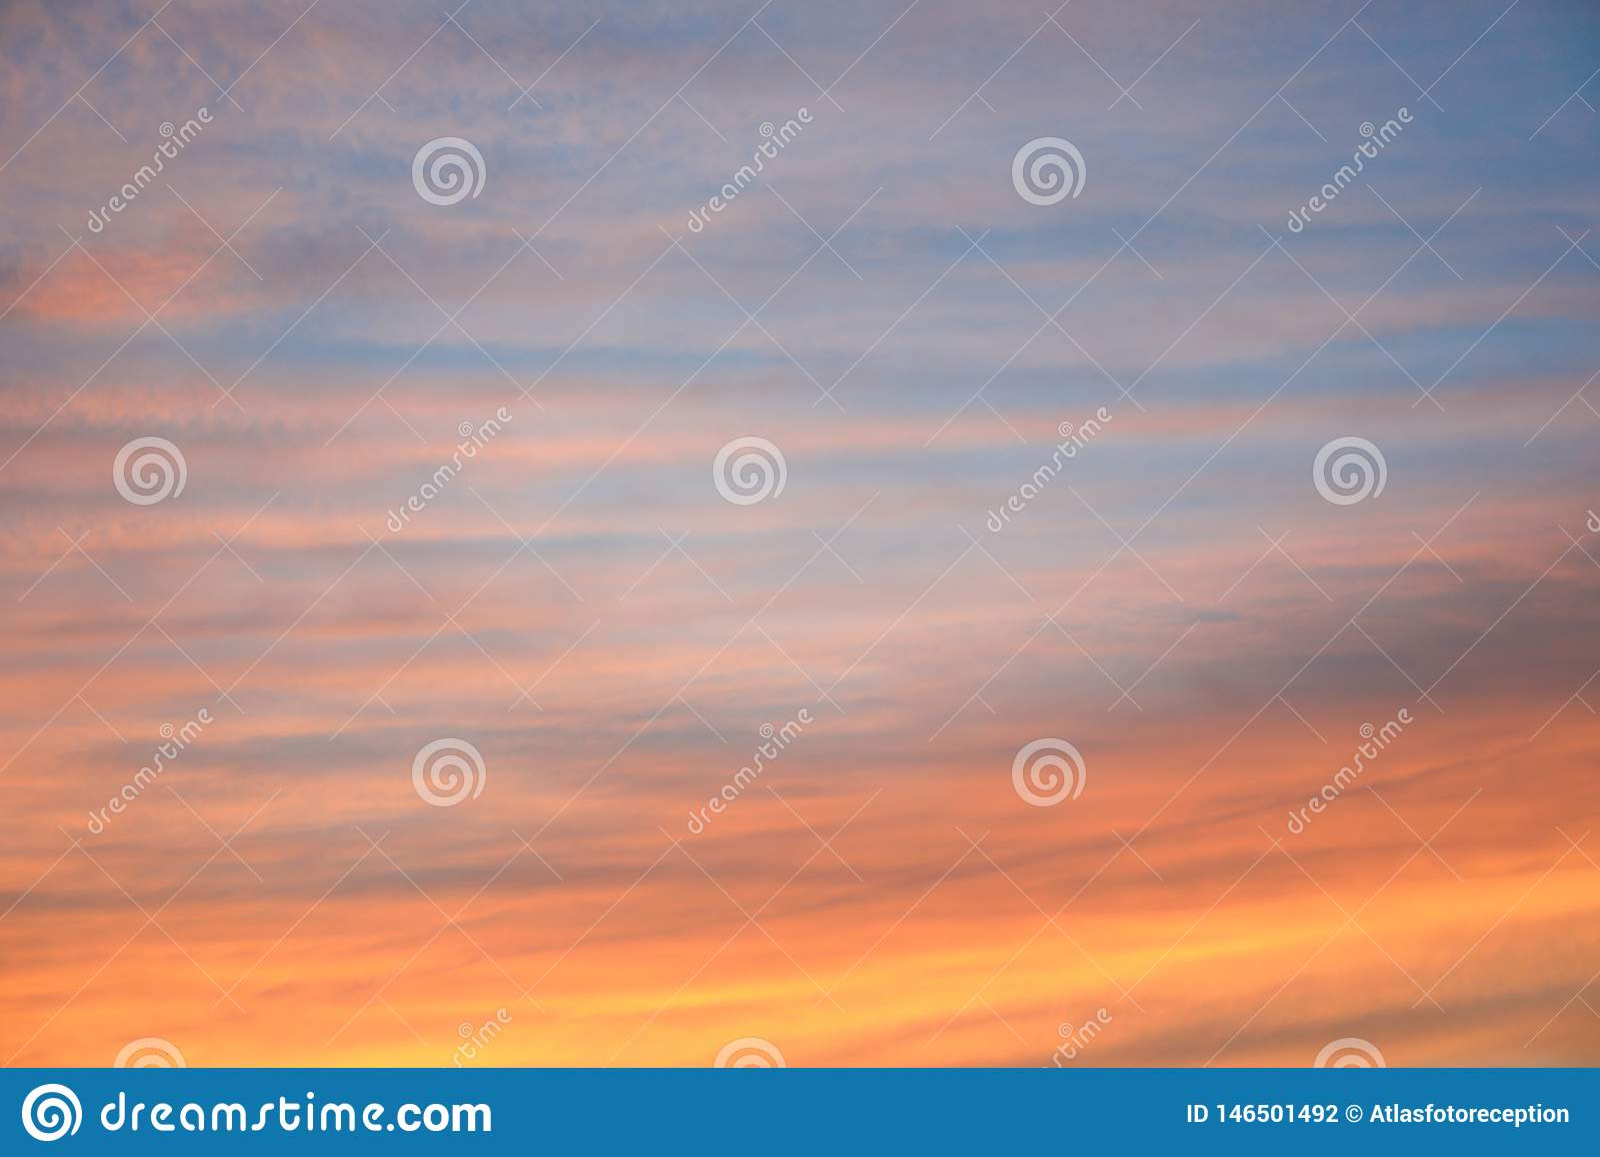 Dramatisk solnedg?nghimmelbakgrund med br?nnhet gul, orange och rosa f?rg f?r moln, naturbakgrund